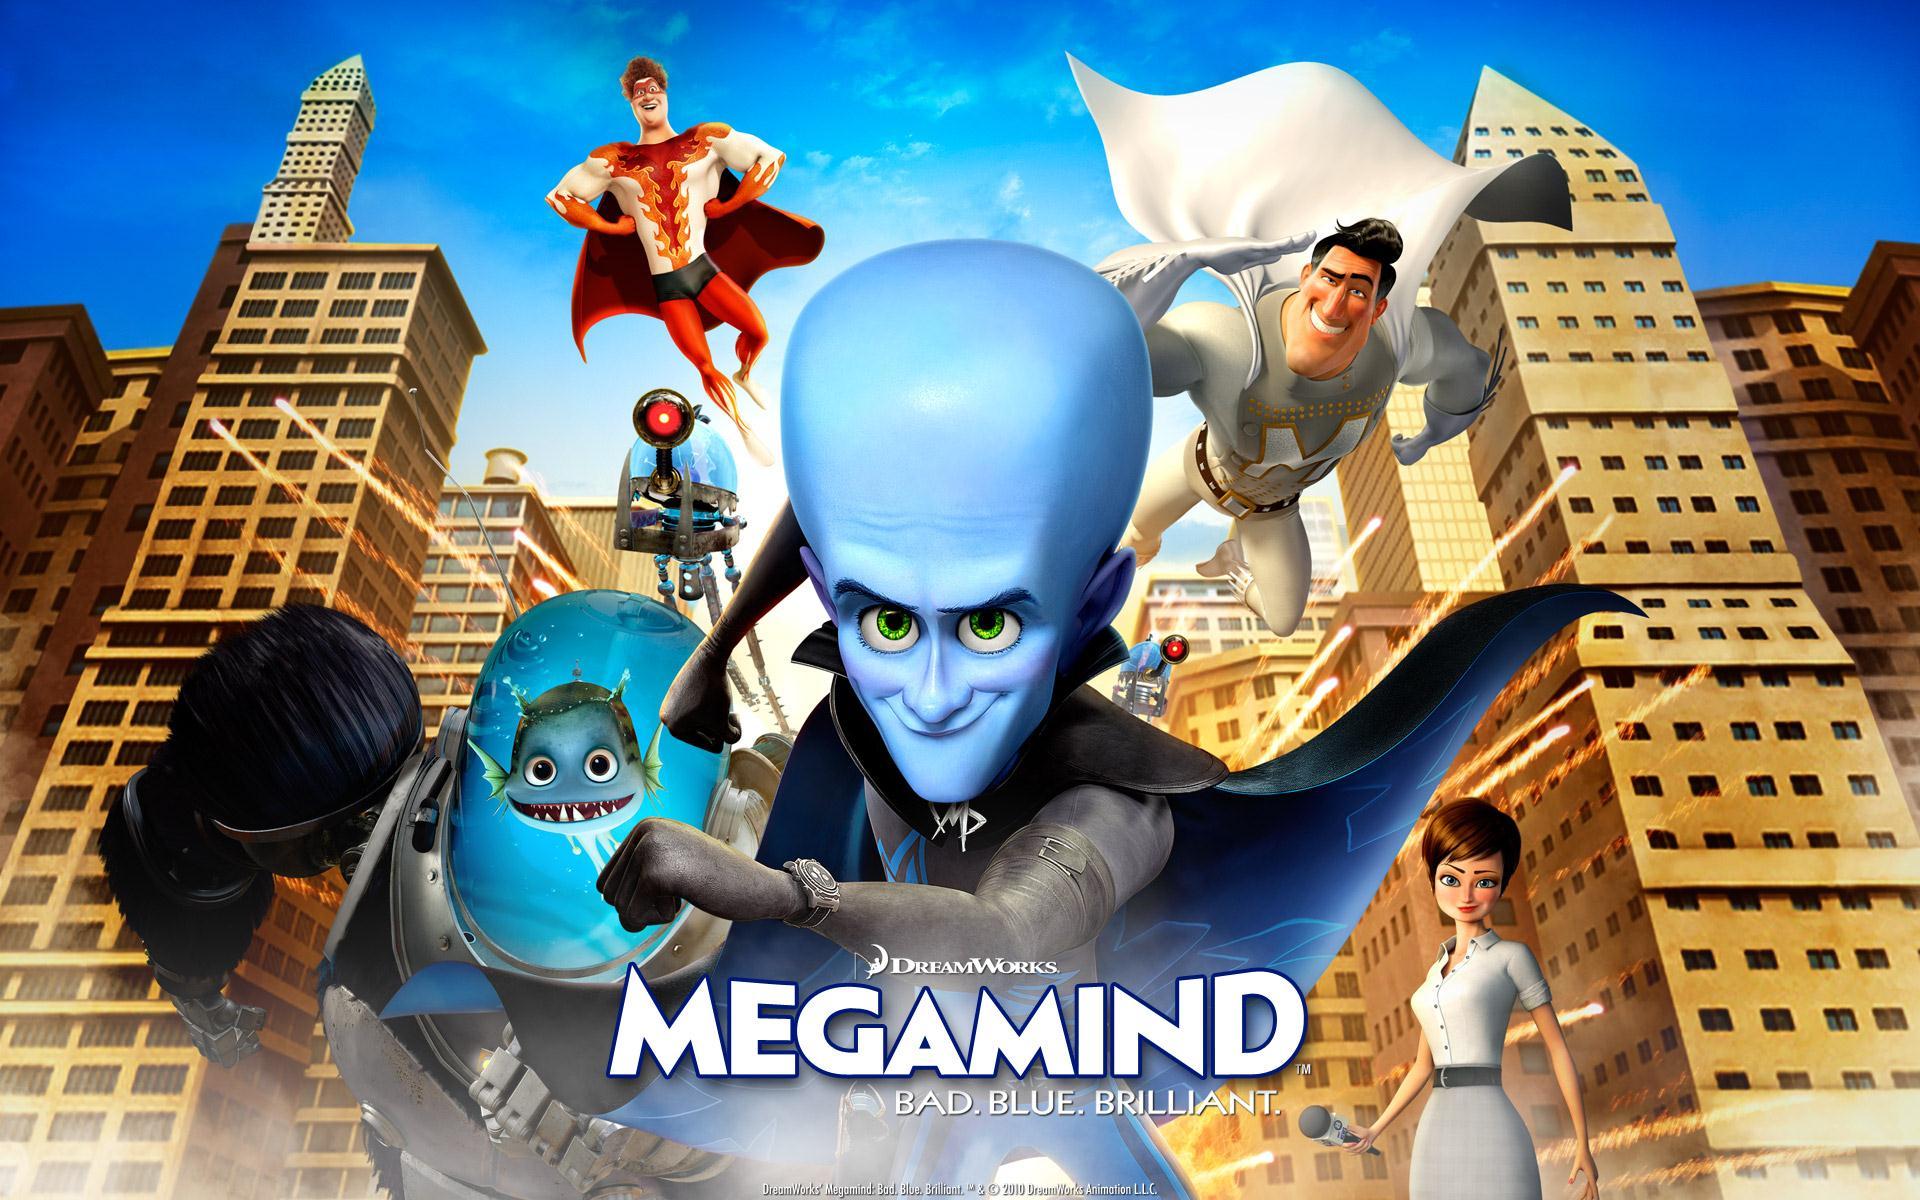 Picture Movie Megamind 3D cartoon movies 1920x1200